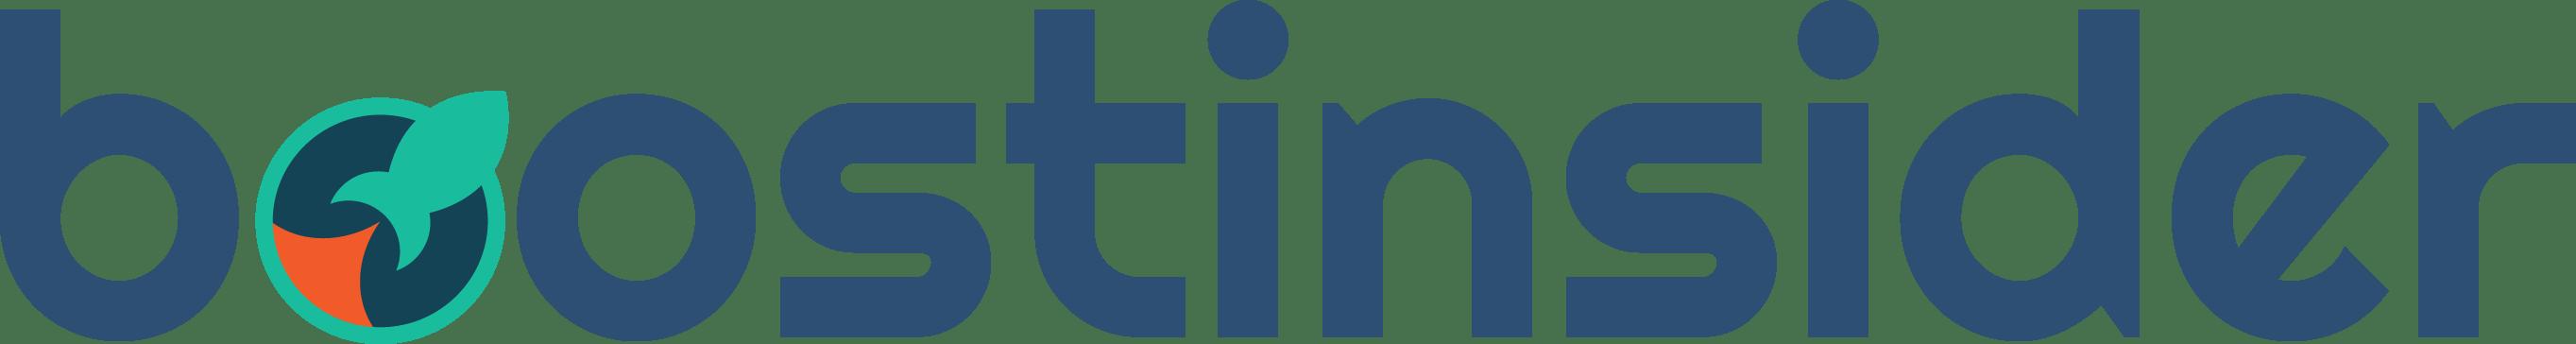 Boostinsider company logo